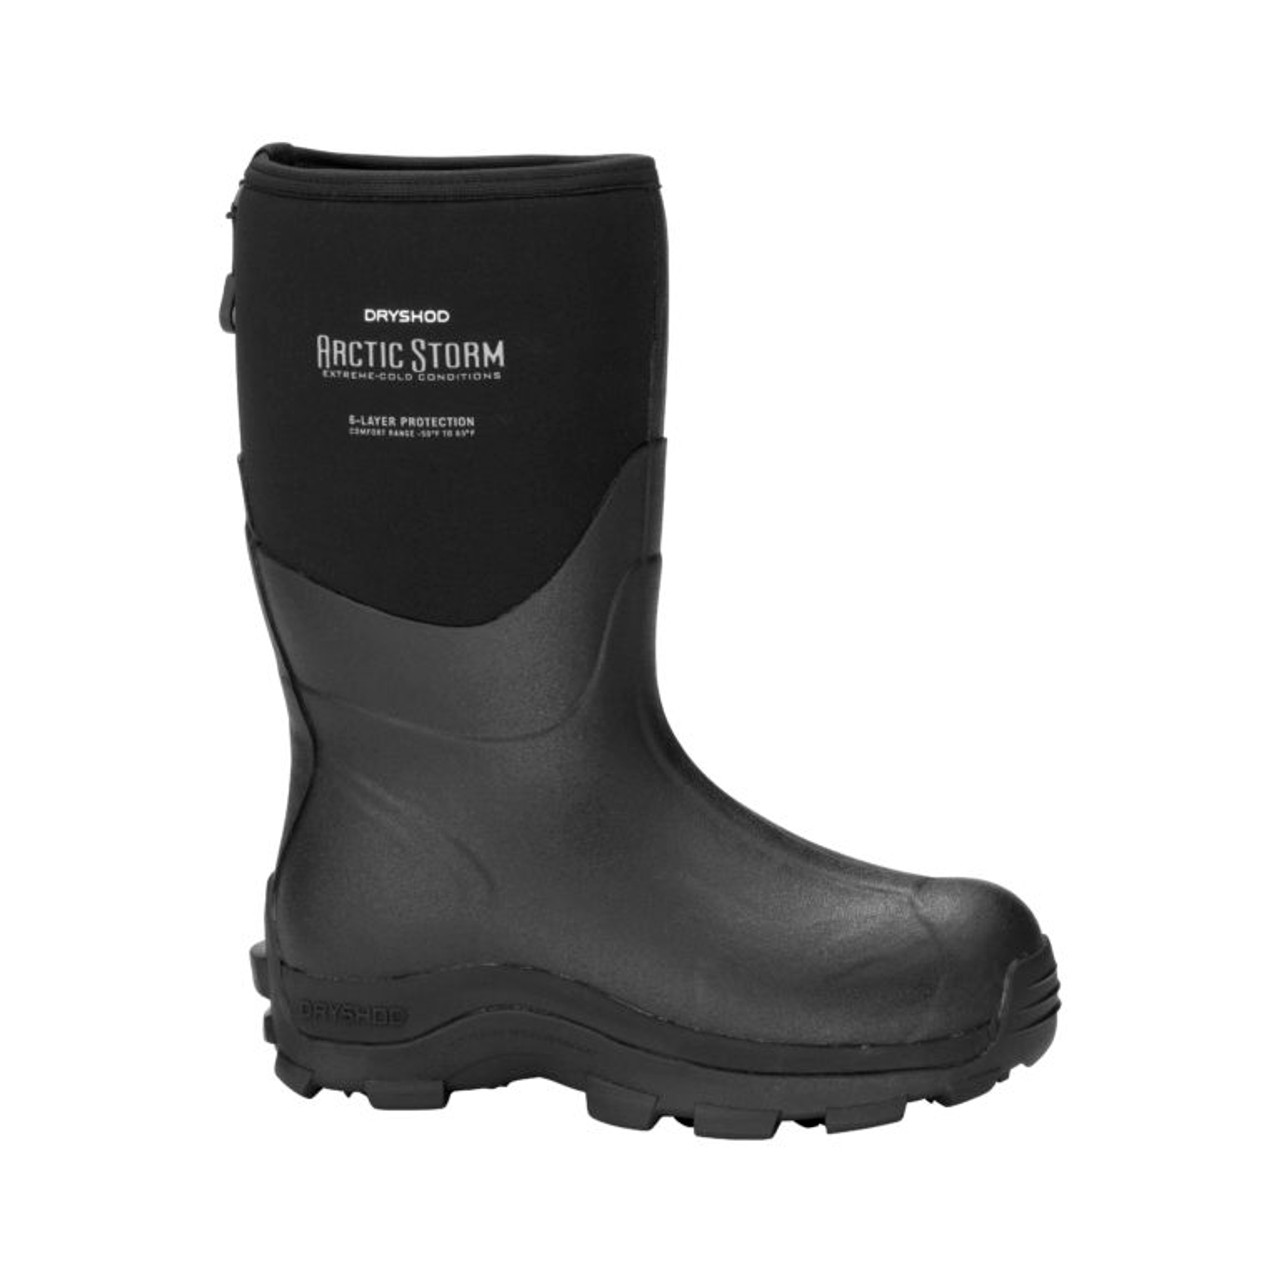 Dryshod Arctic Storm Mid Boot